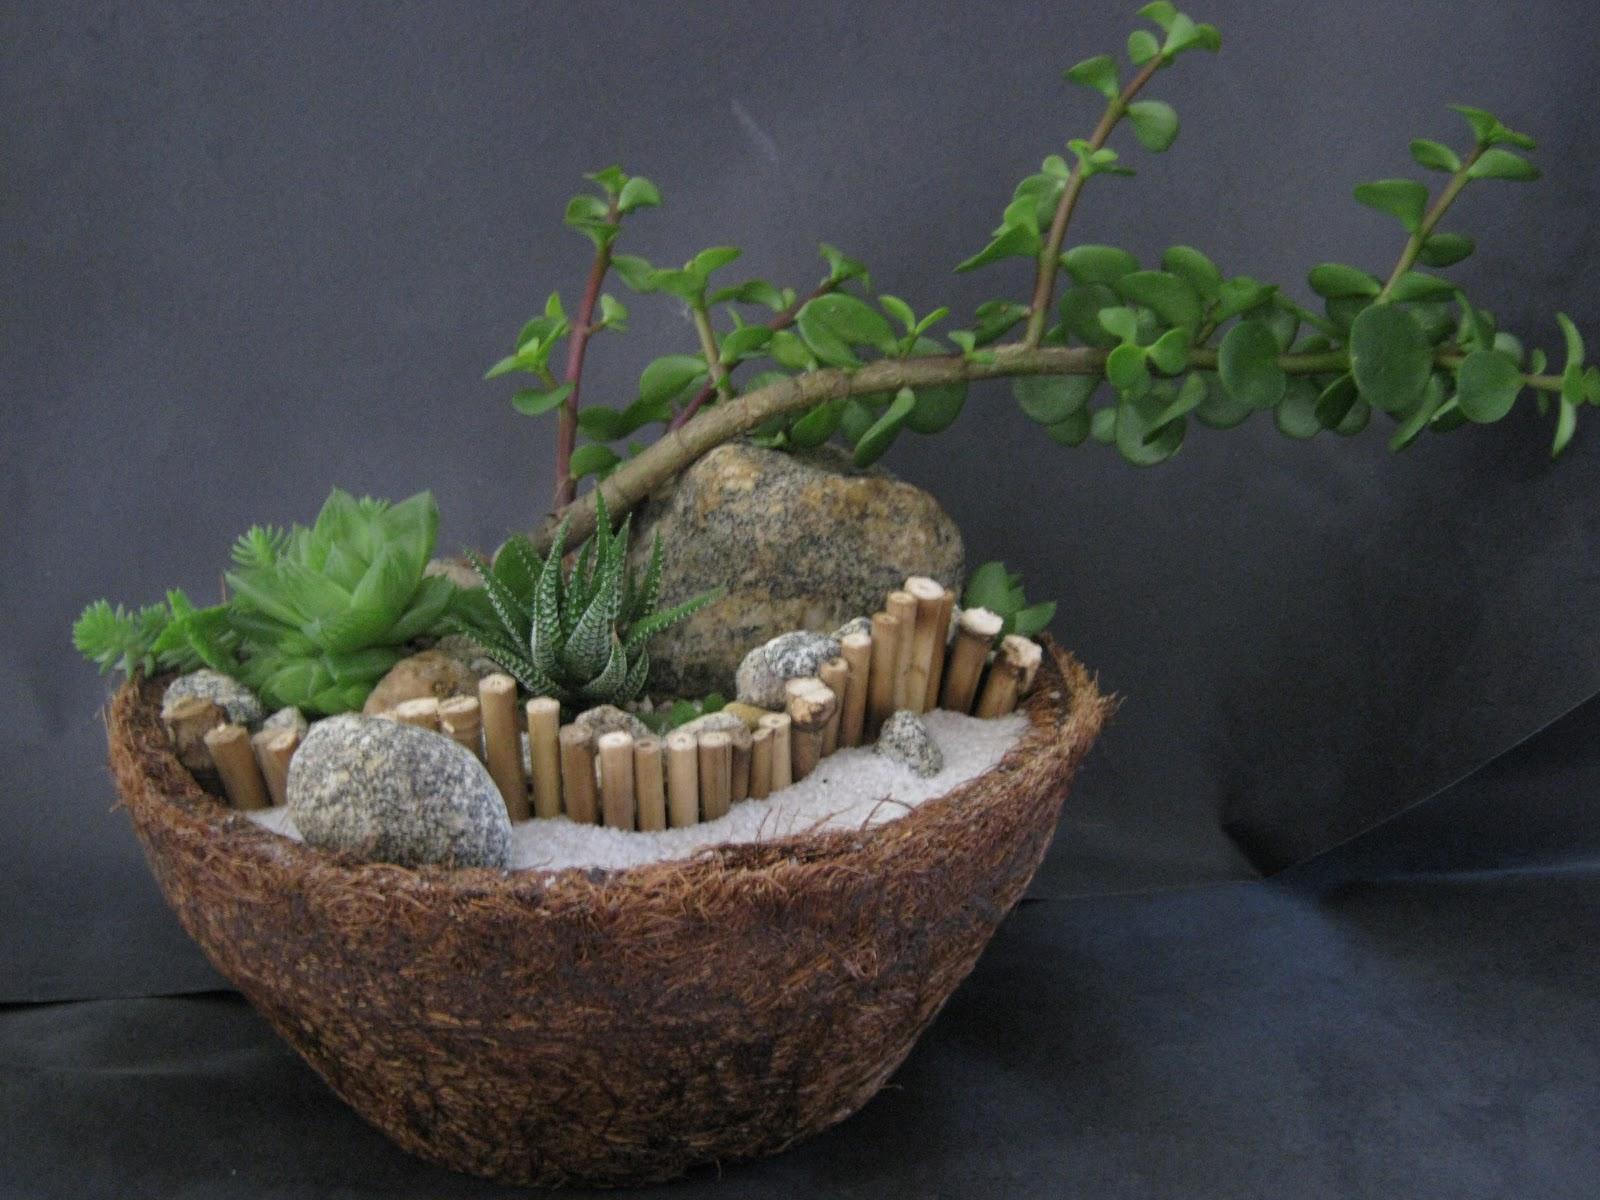 mini jardins em vidro:Claudio Lourenço Paisagismo: Mini-Jardins de Suculentas em Jarro de